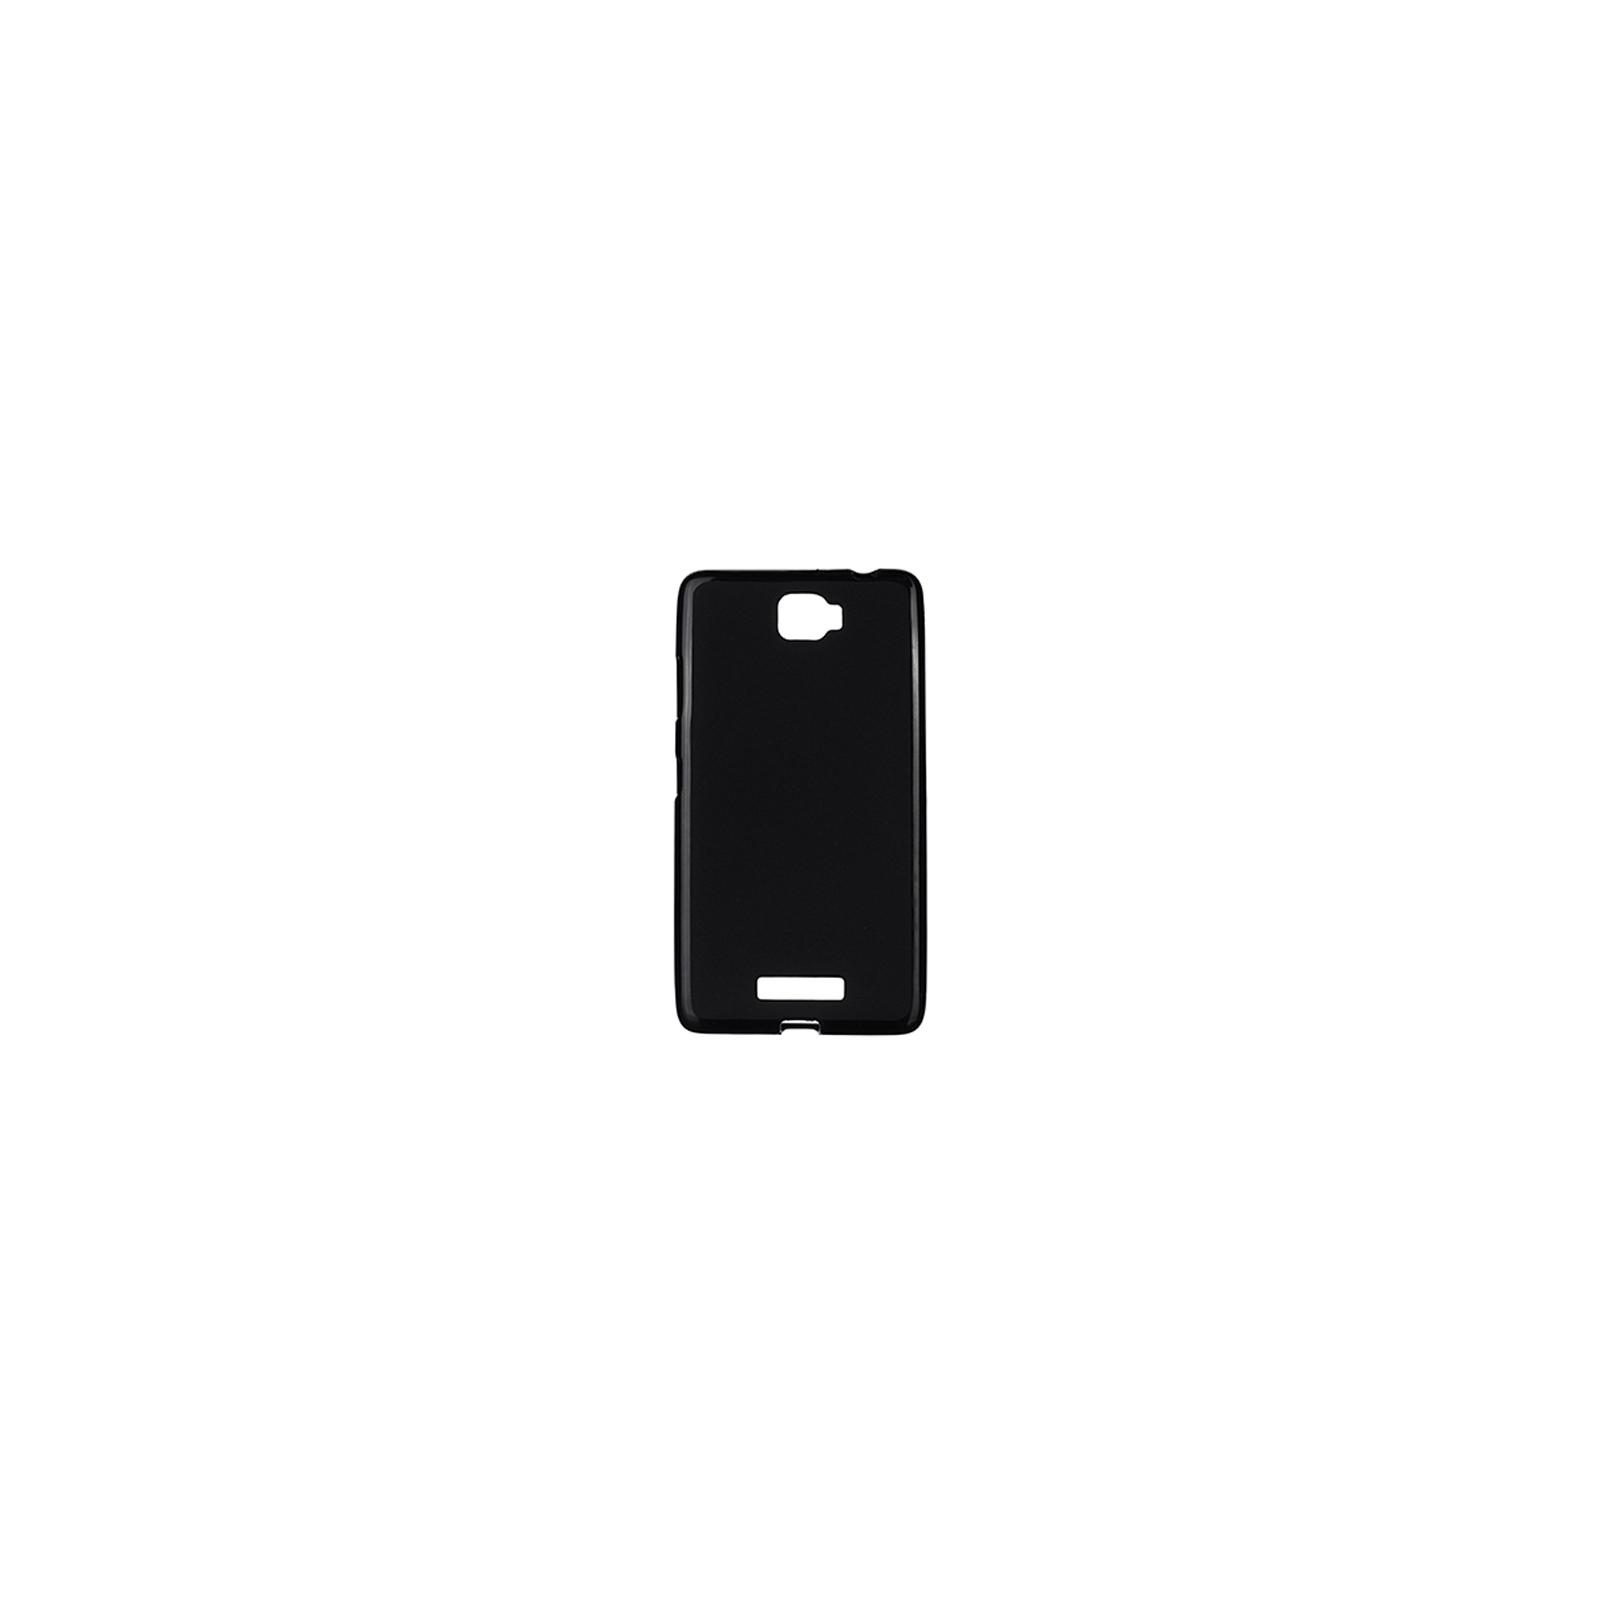 Чехол для моб. телефона Drobak для Lenovo S856 Black /Elastic PU/ (216721) (216721)